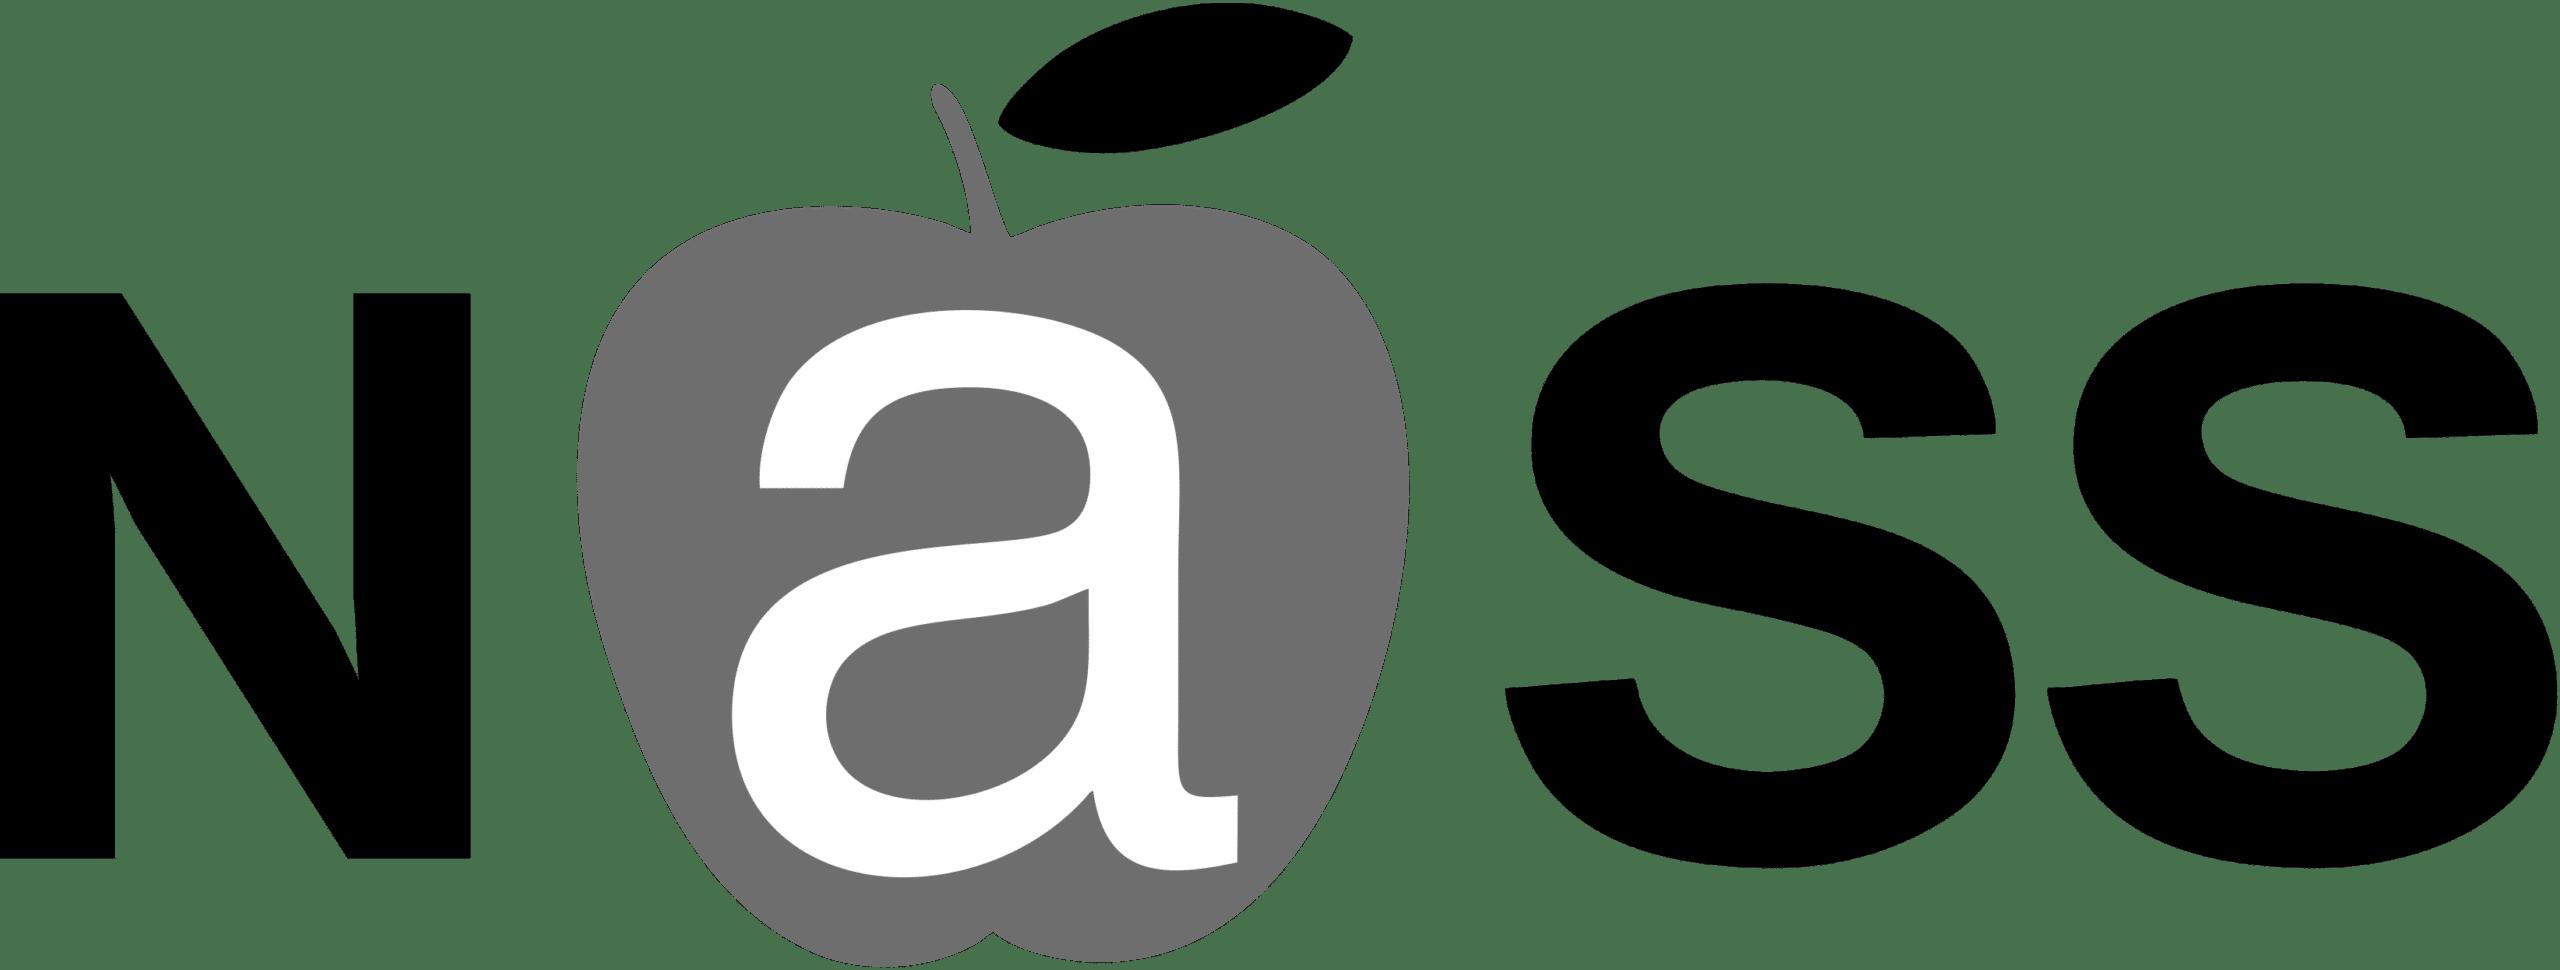 Nass Black and White logo